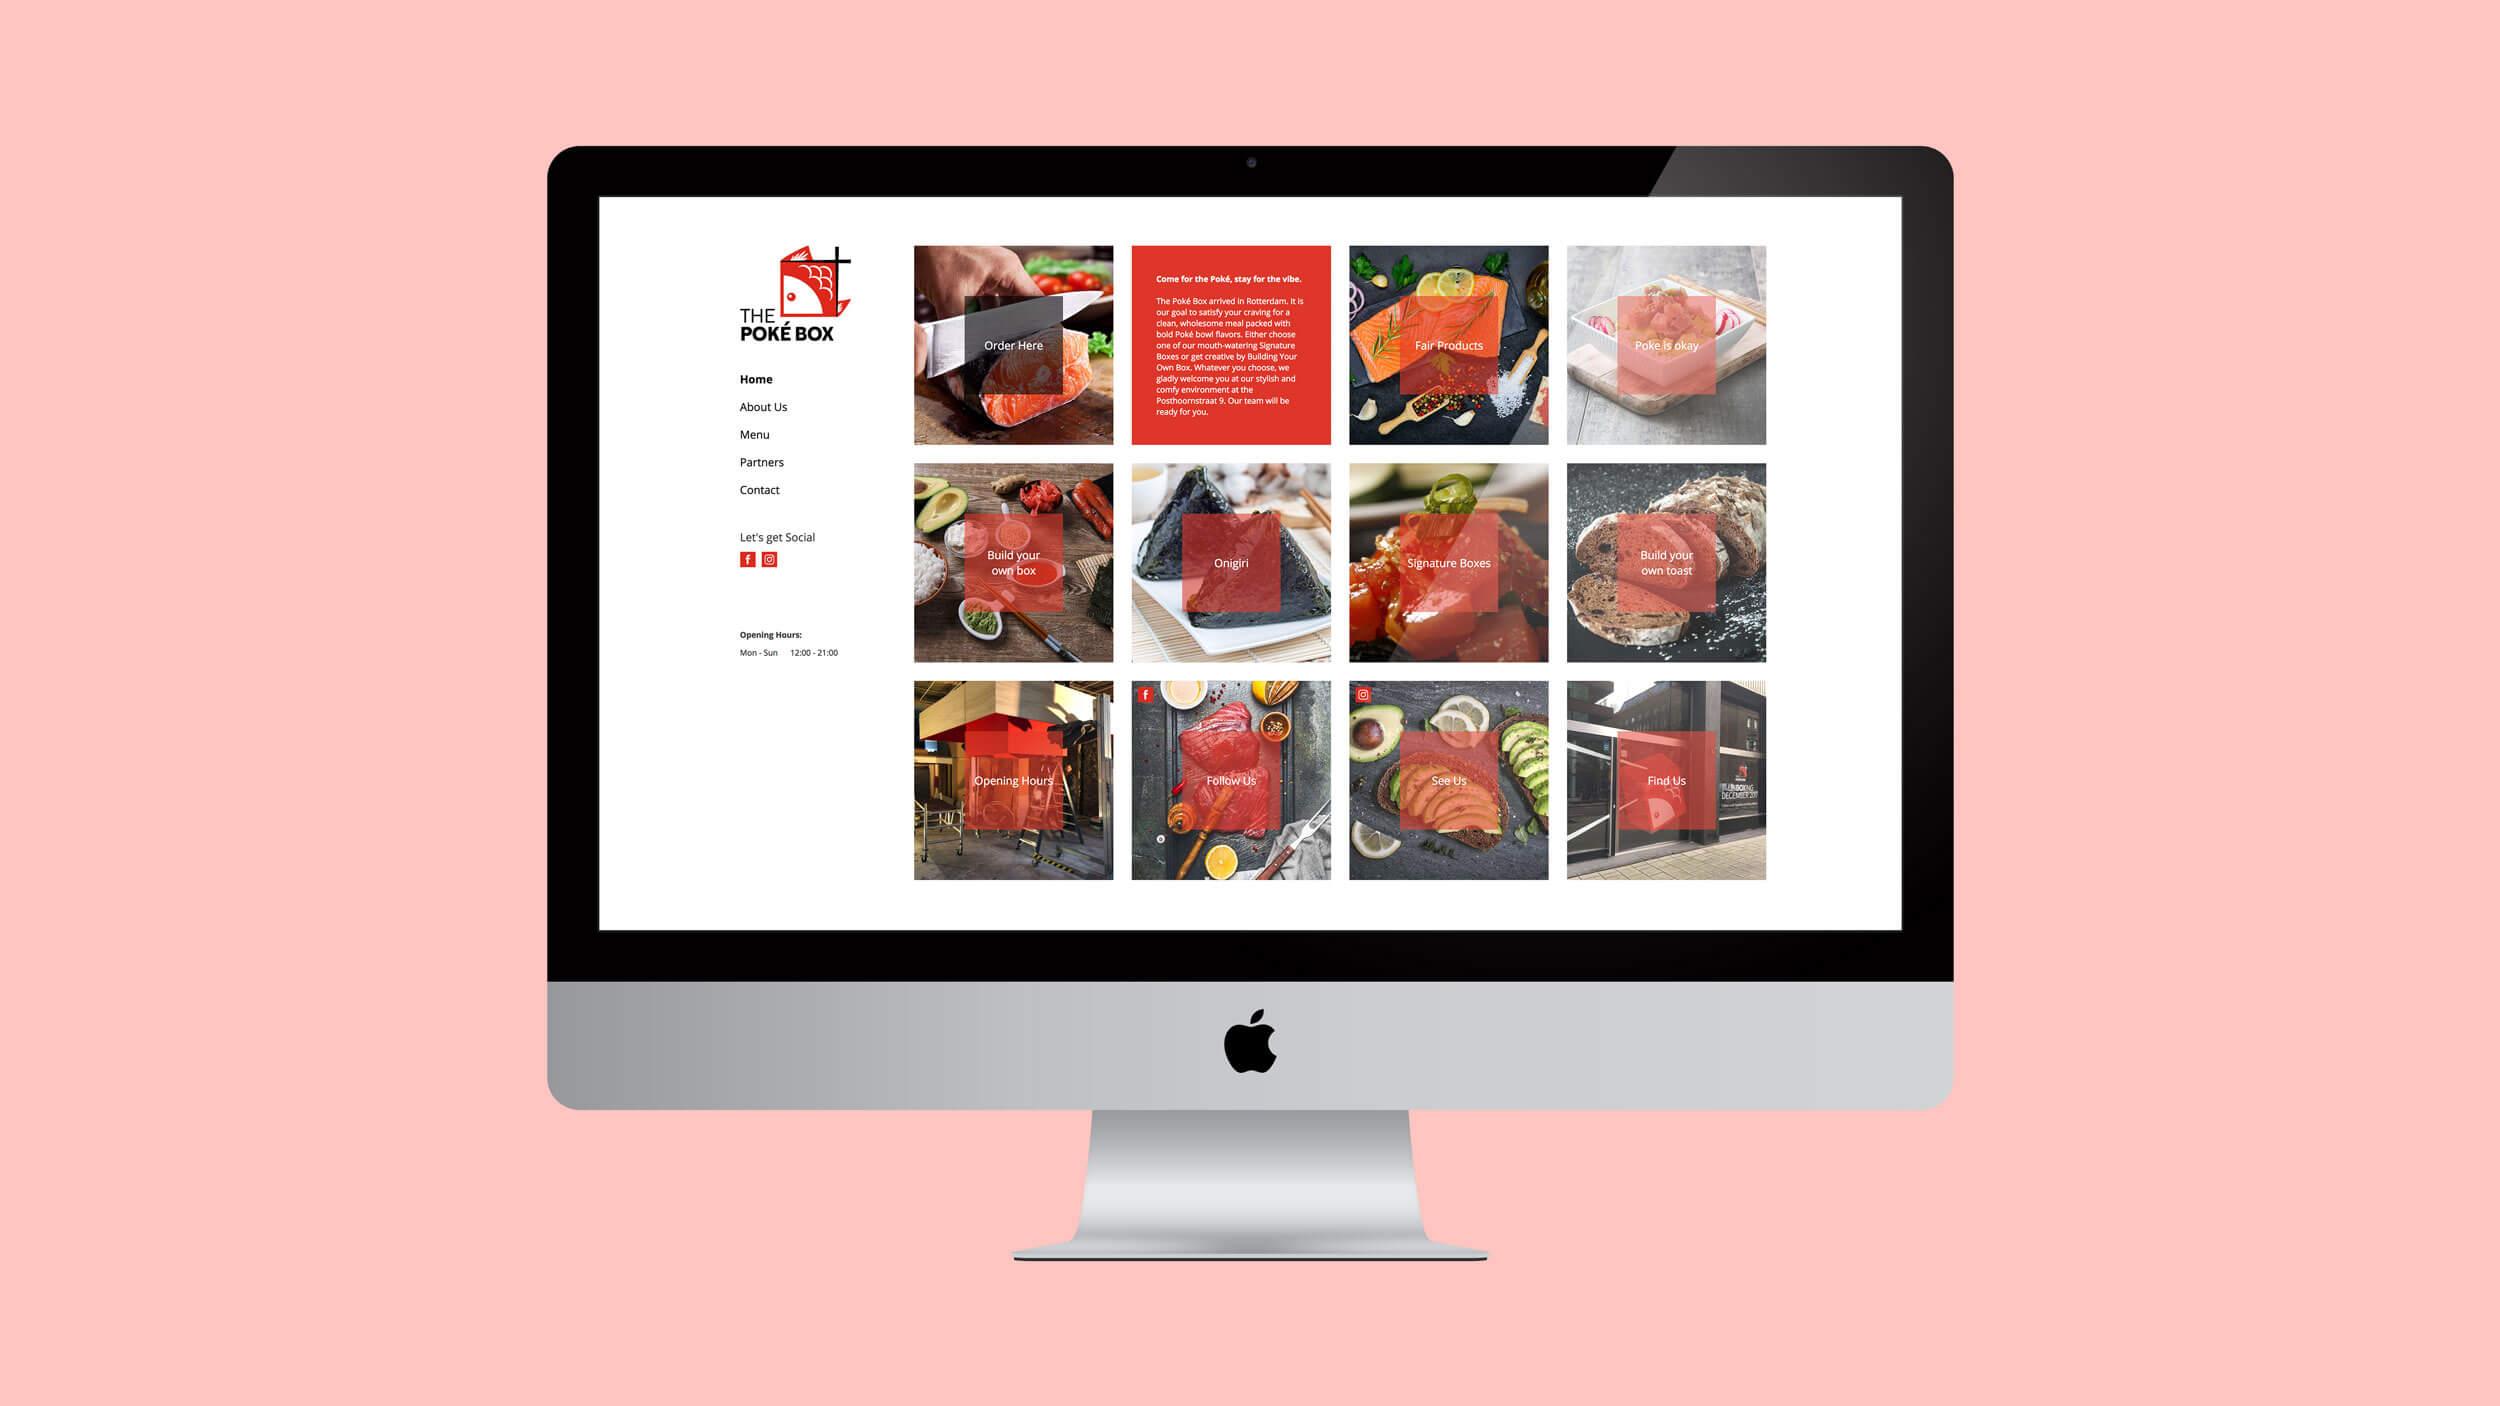 The Poké Box, website, Mixus studio